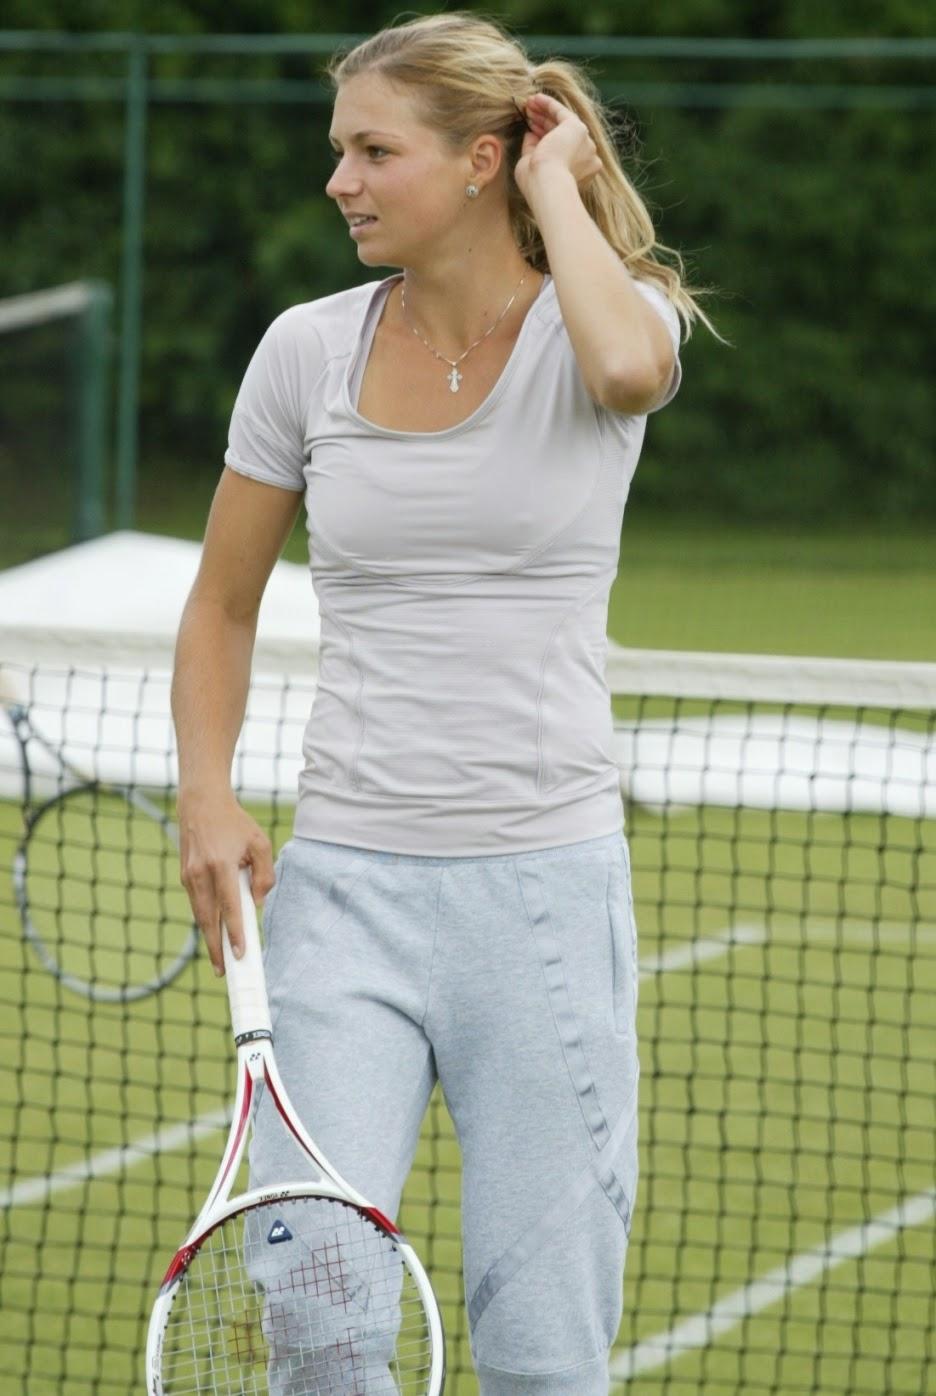 Beautiful Tennis Girls